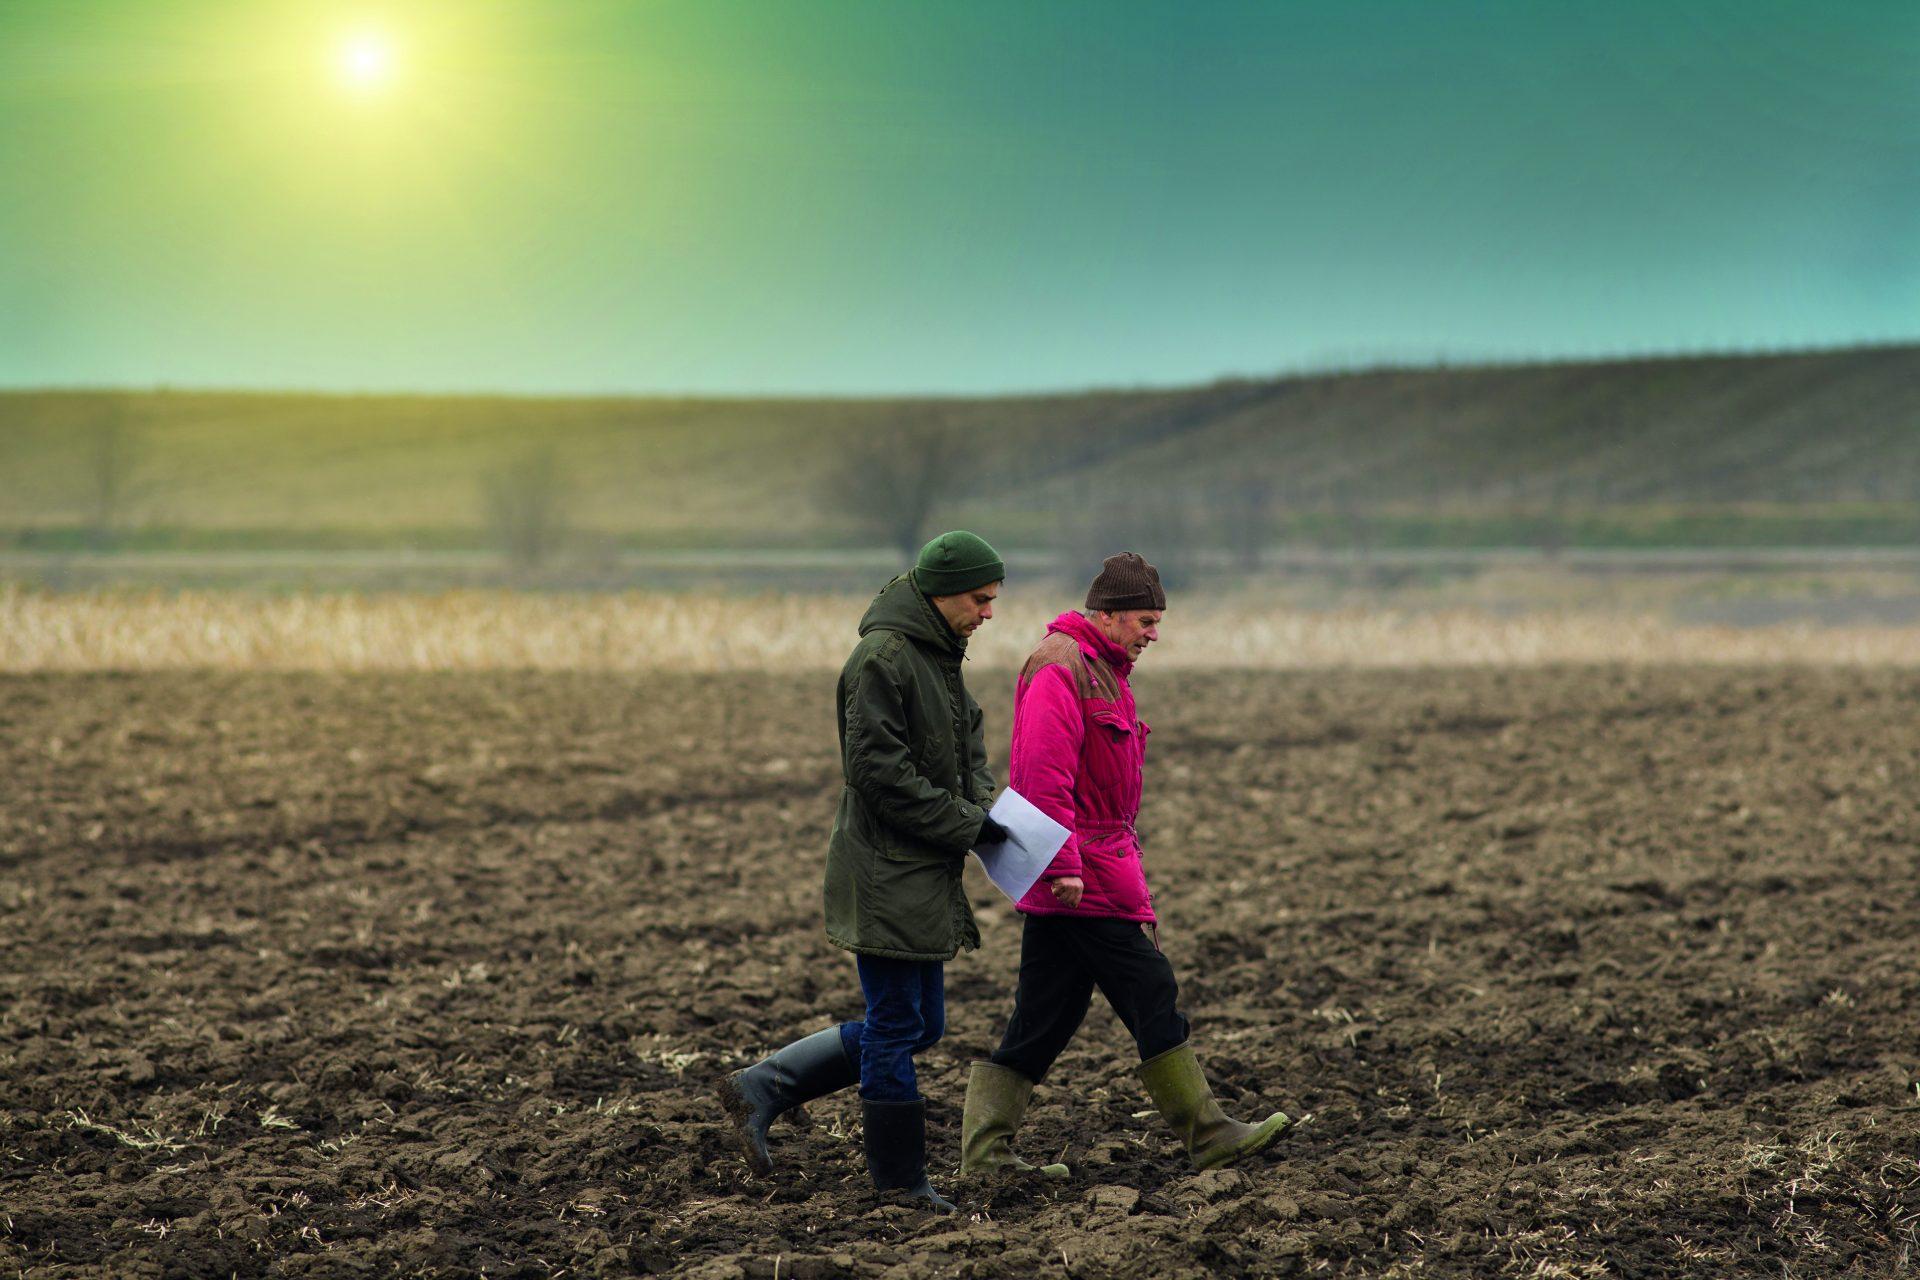 two-farmers-walking-on-a-plowed-brown-field-under-the-sun